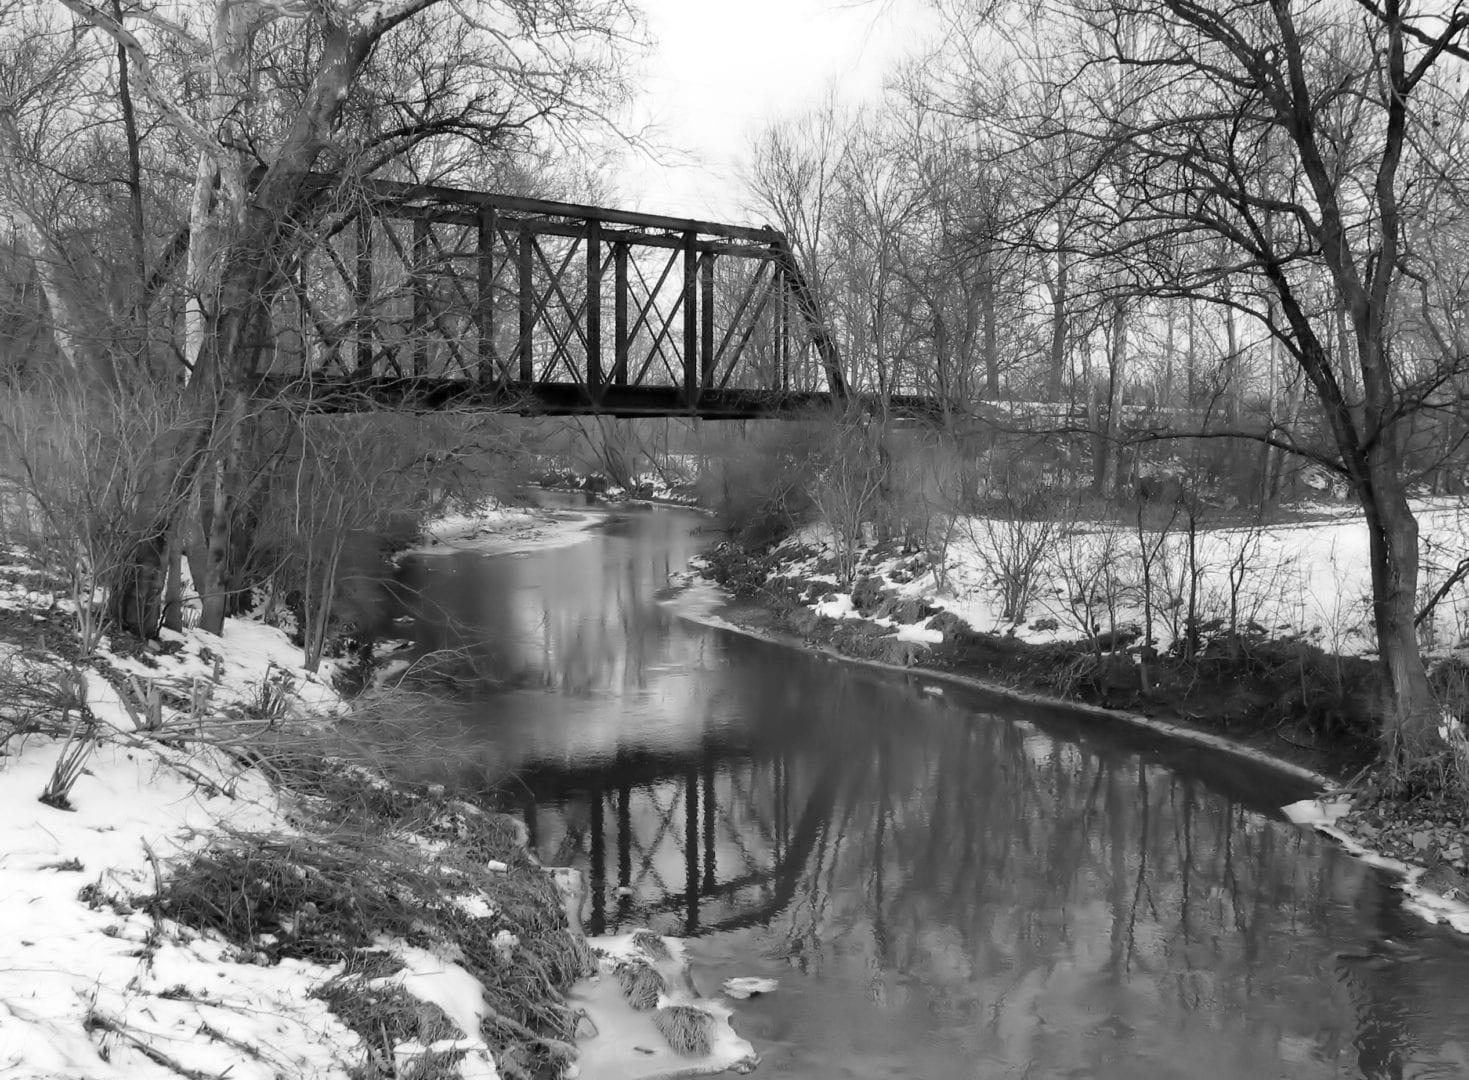 A black and white photo of a bridge